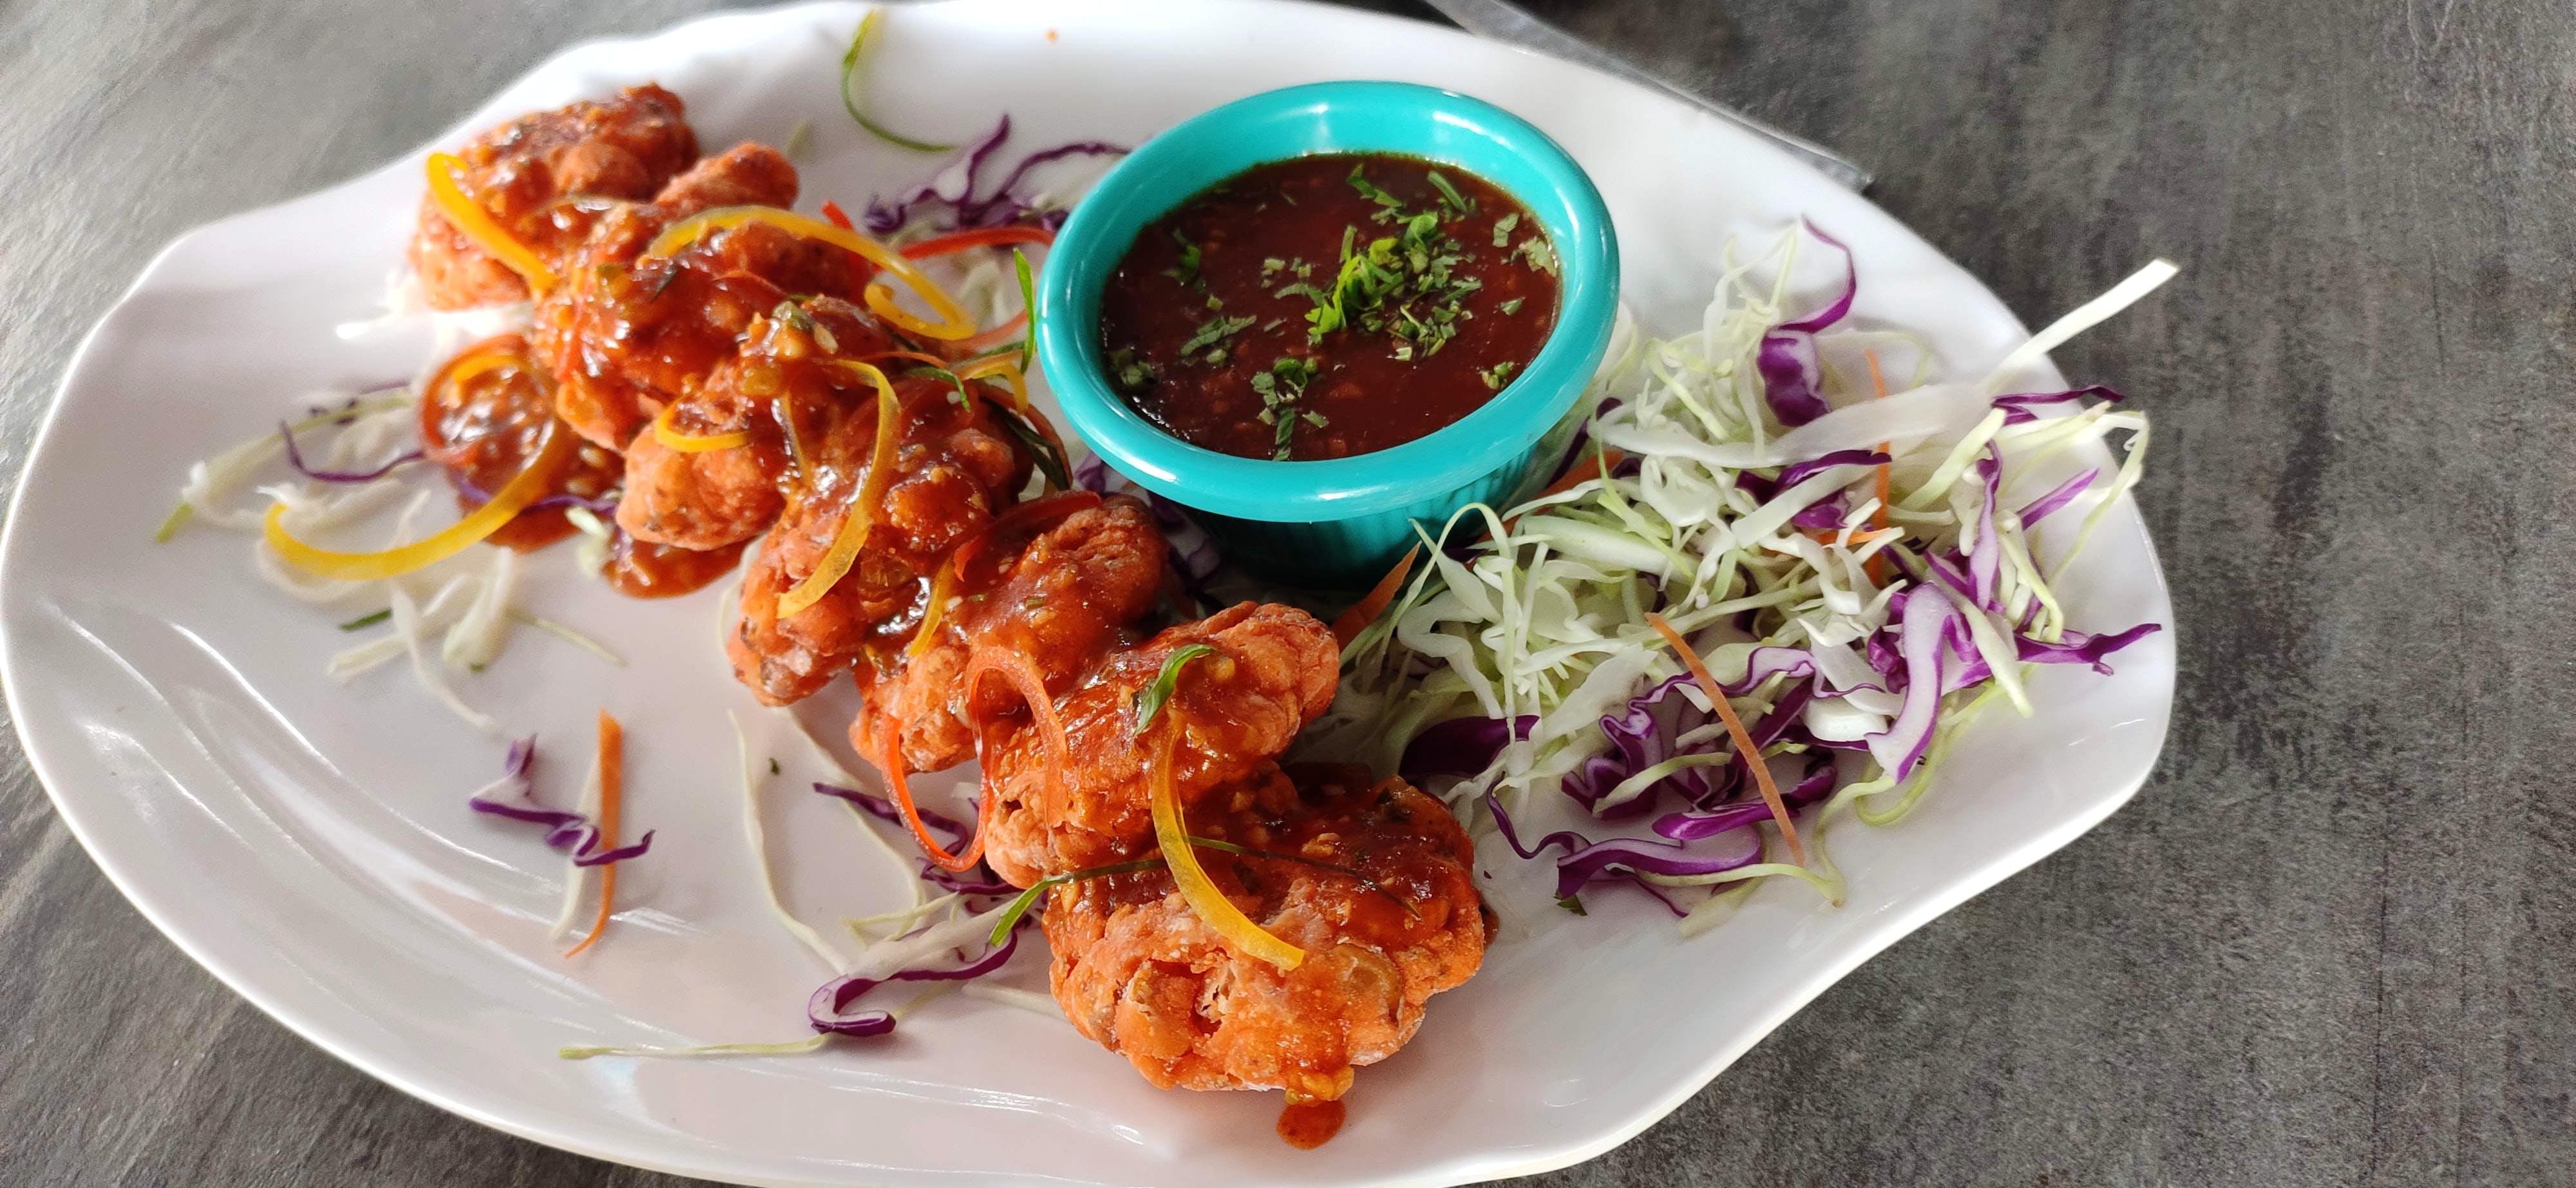 Dish,Food,Cuisine,Ingredient,Satay,Fried food,Meat,Produce,Recipe,Chicken tikka